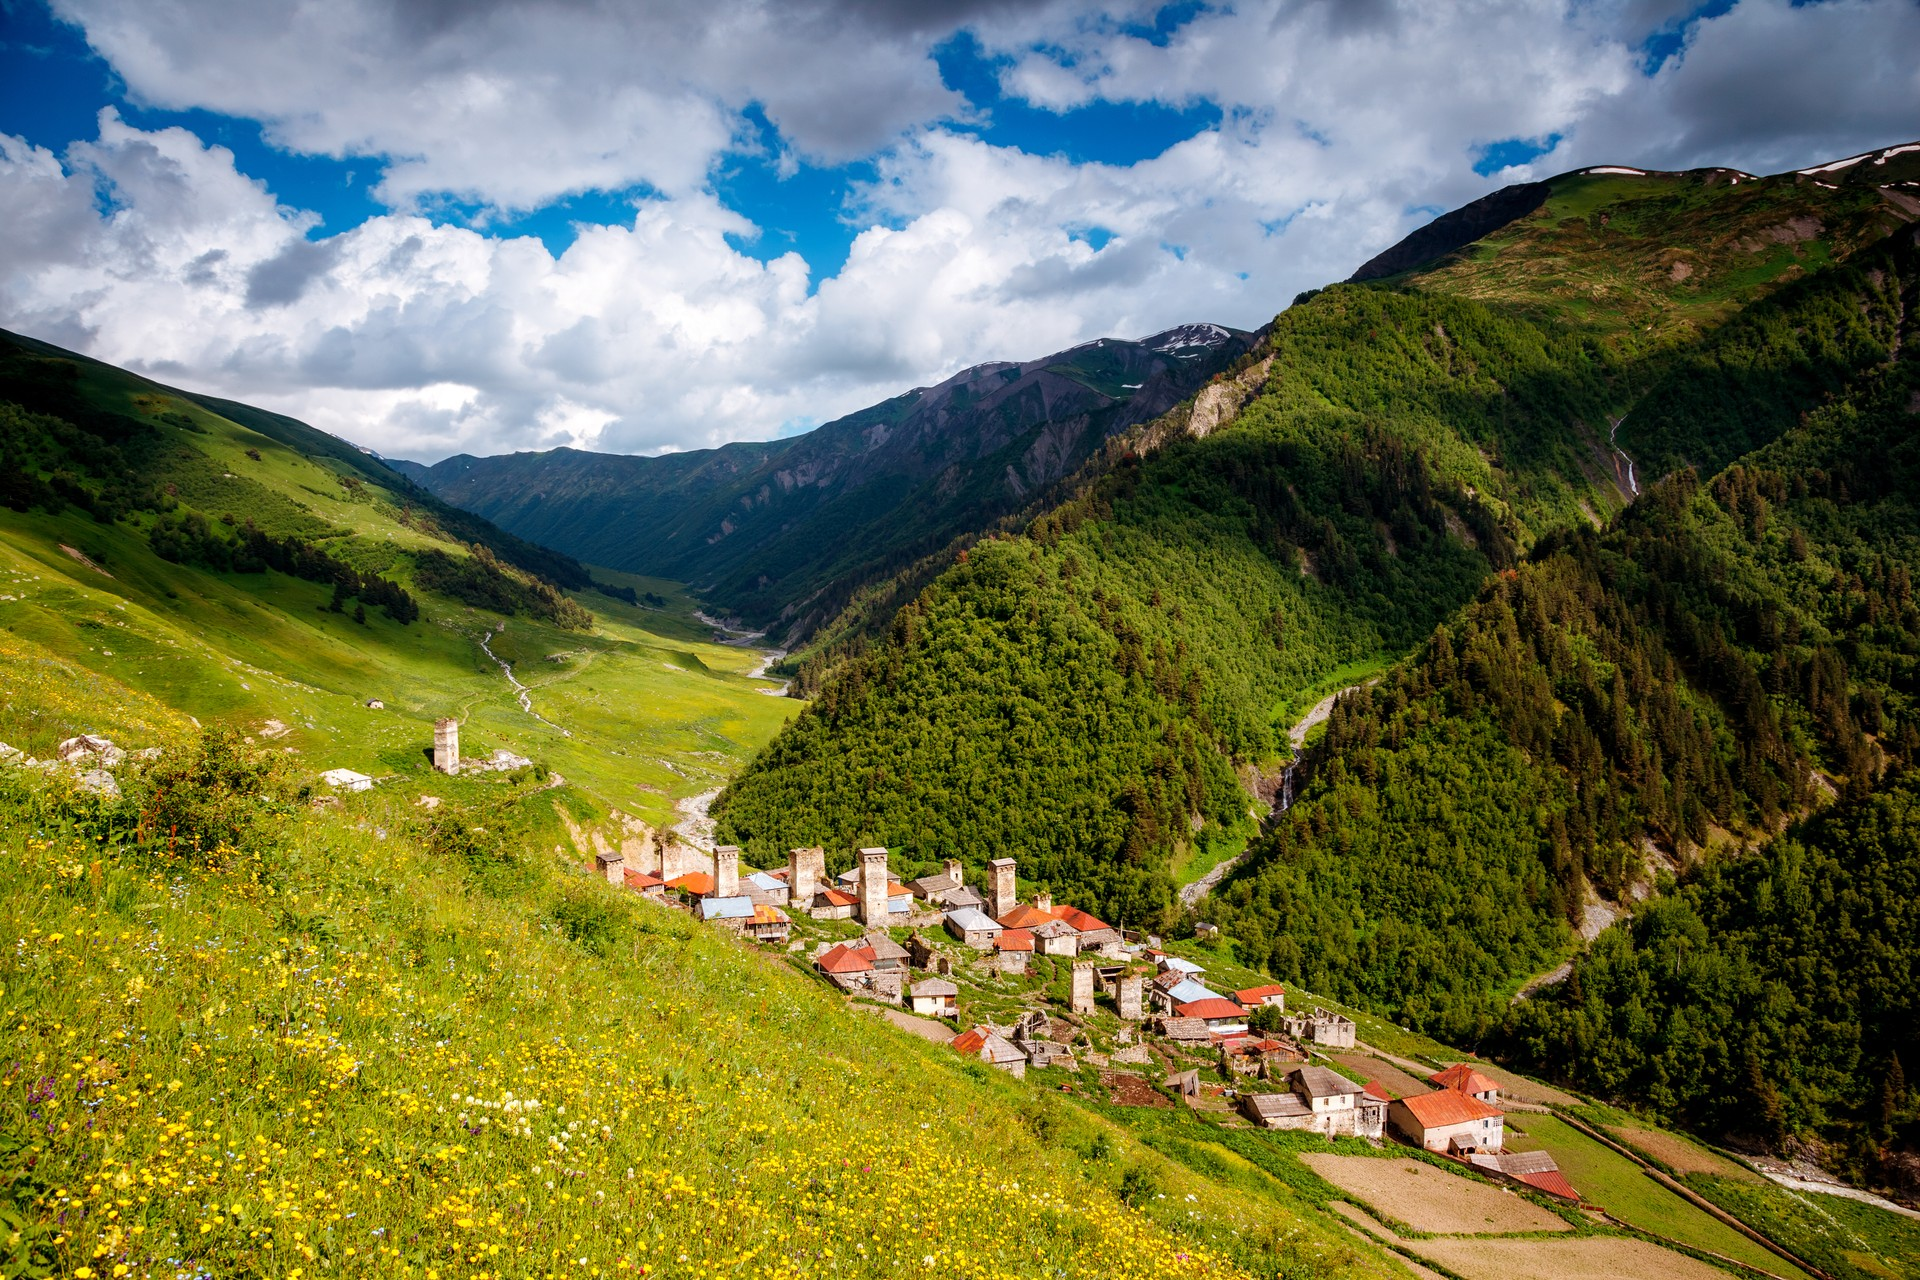 The beautiful Adishi village in the heart of the Svaneti region